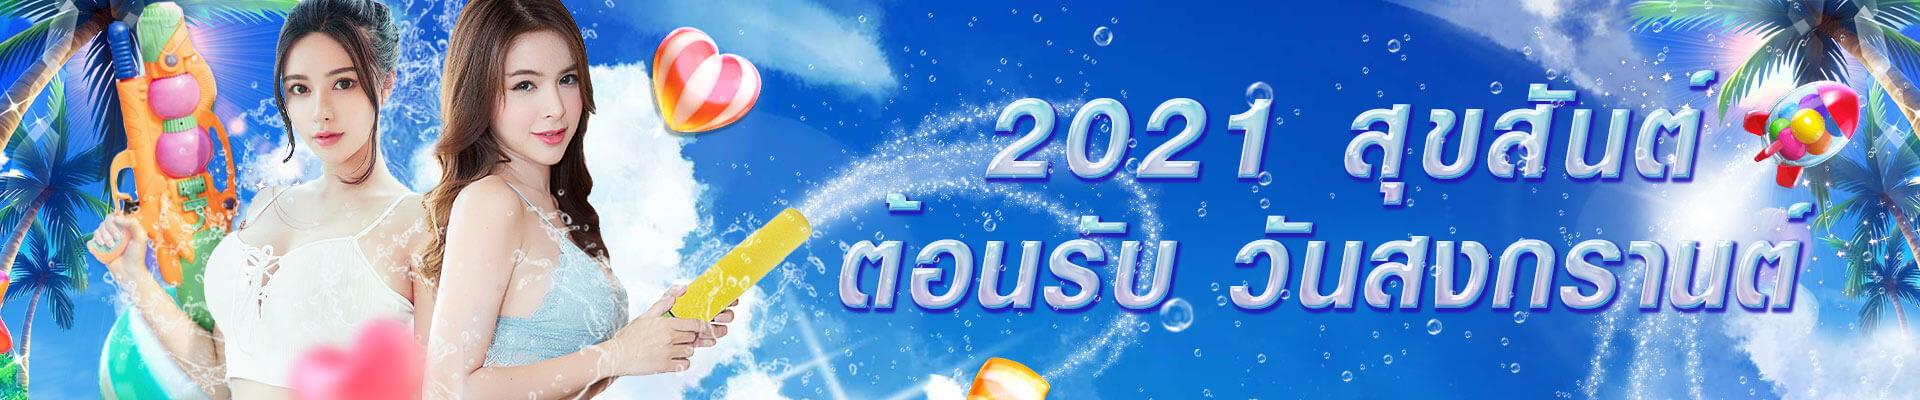 Songkran Day